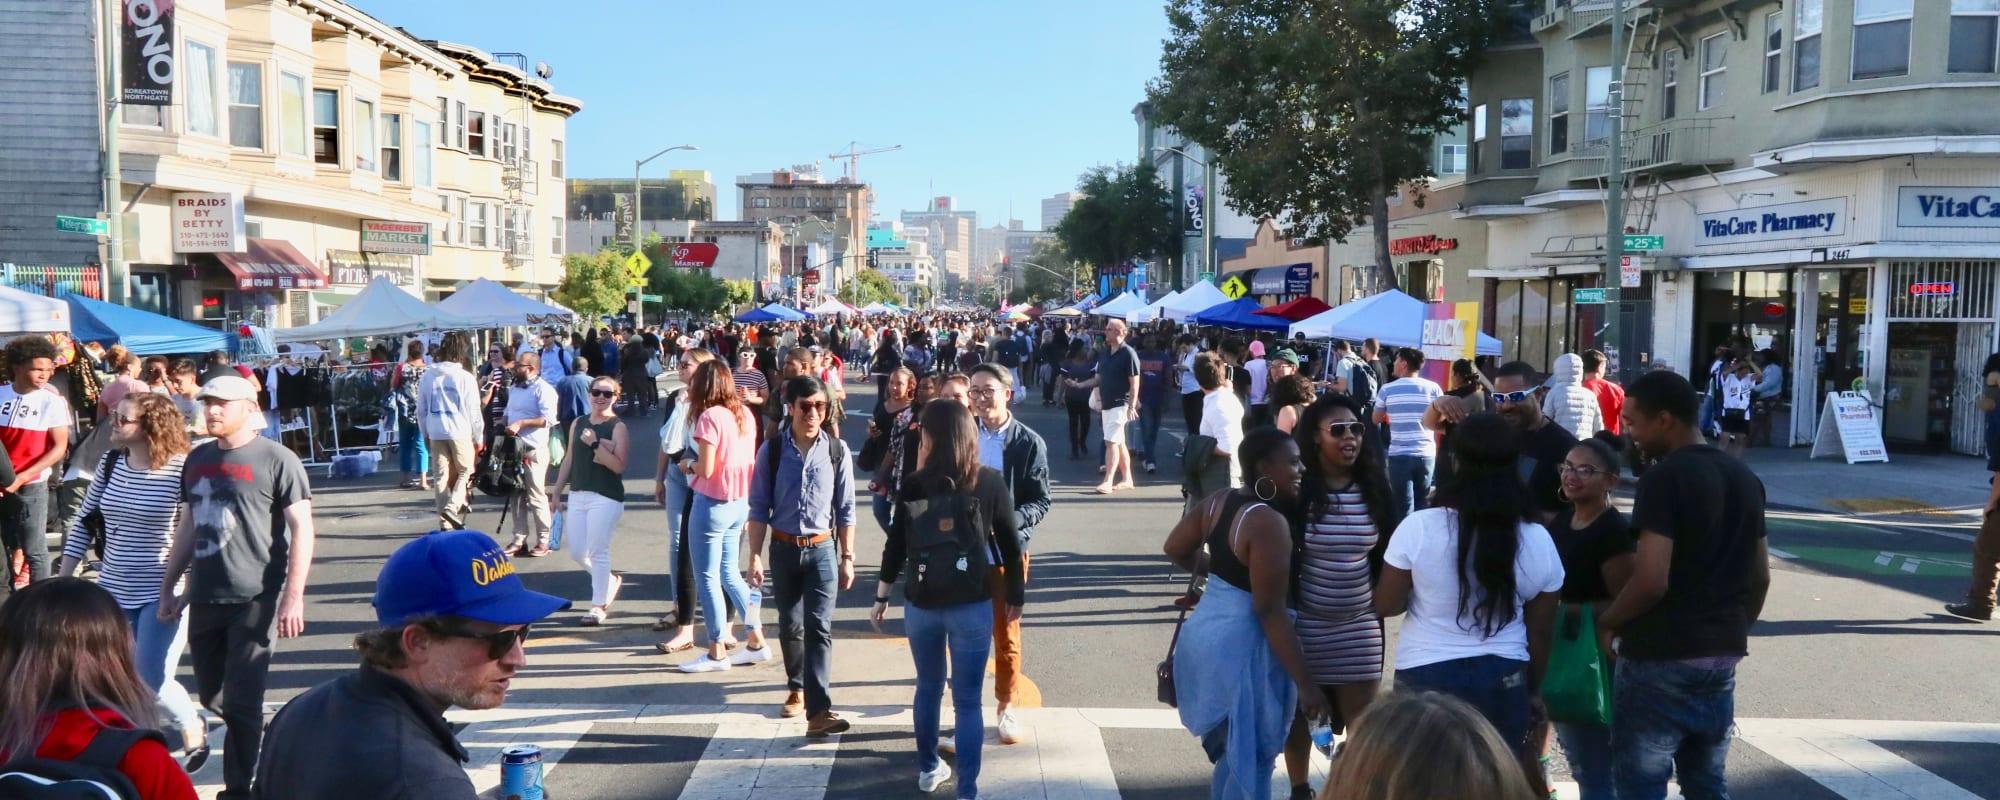 Bright street with walking people near The Moran in Oakland, California